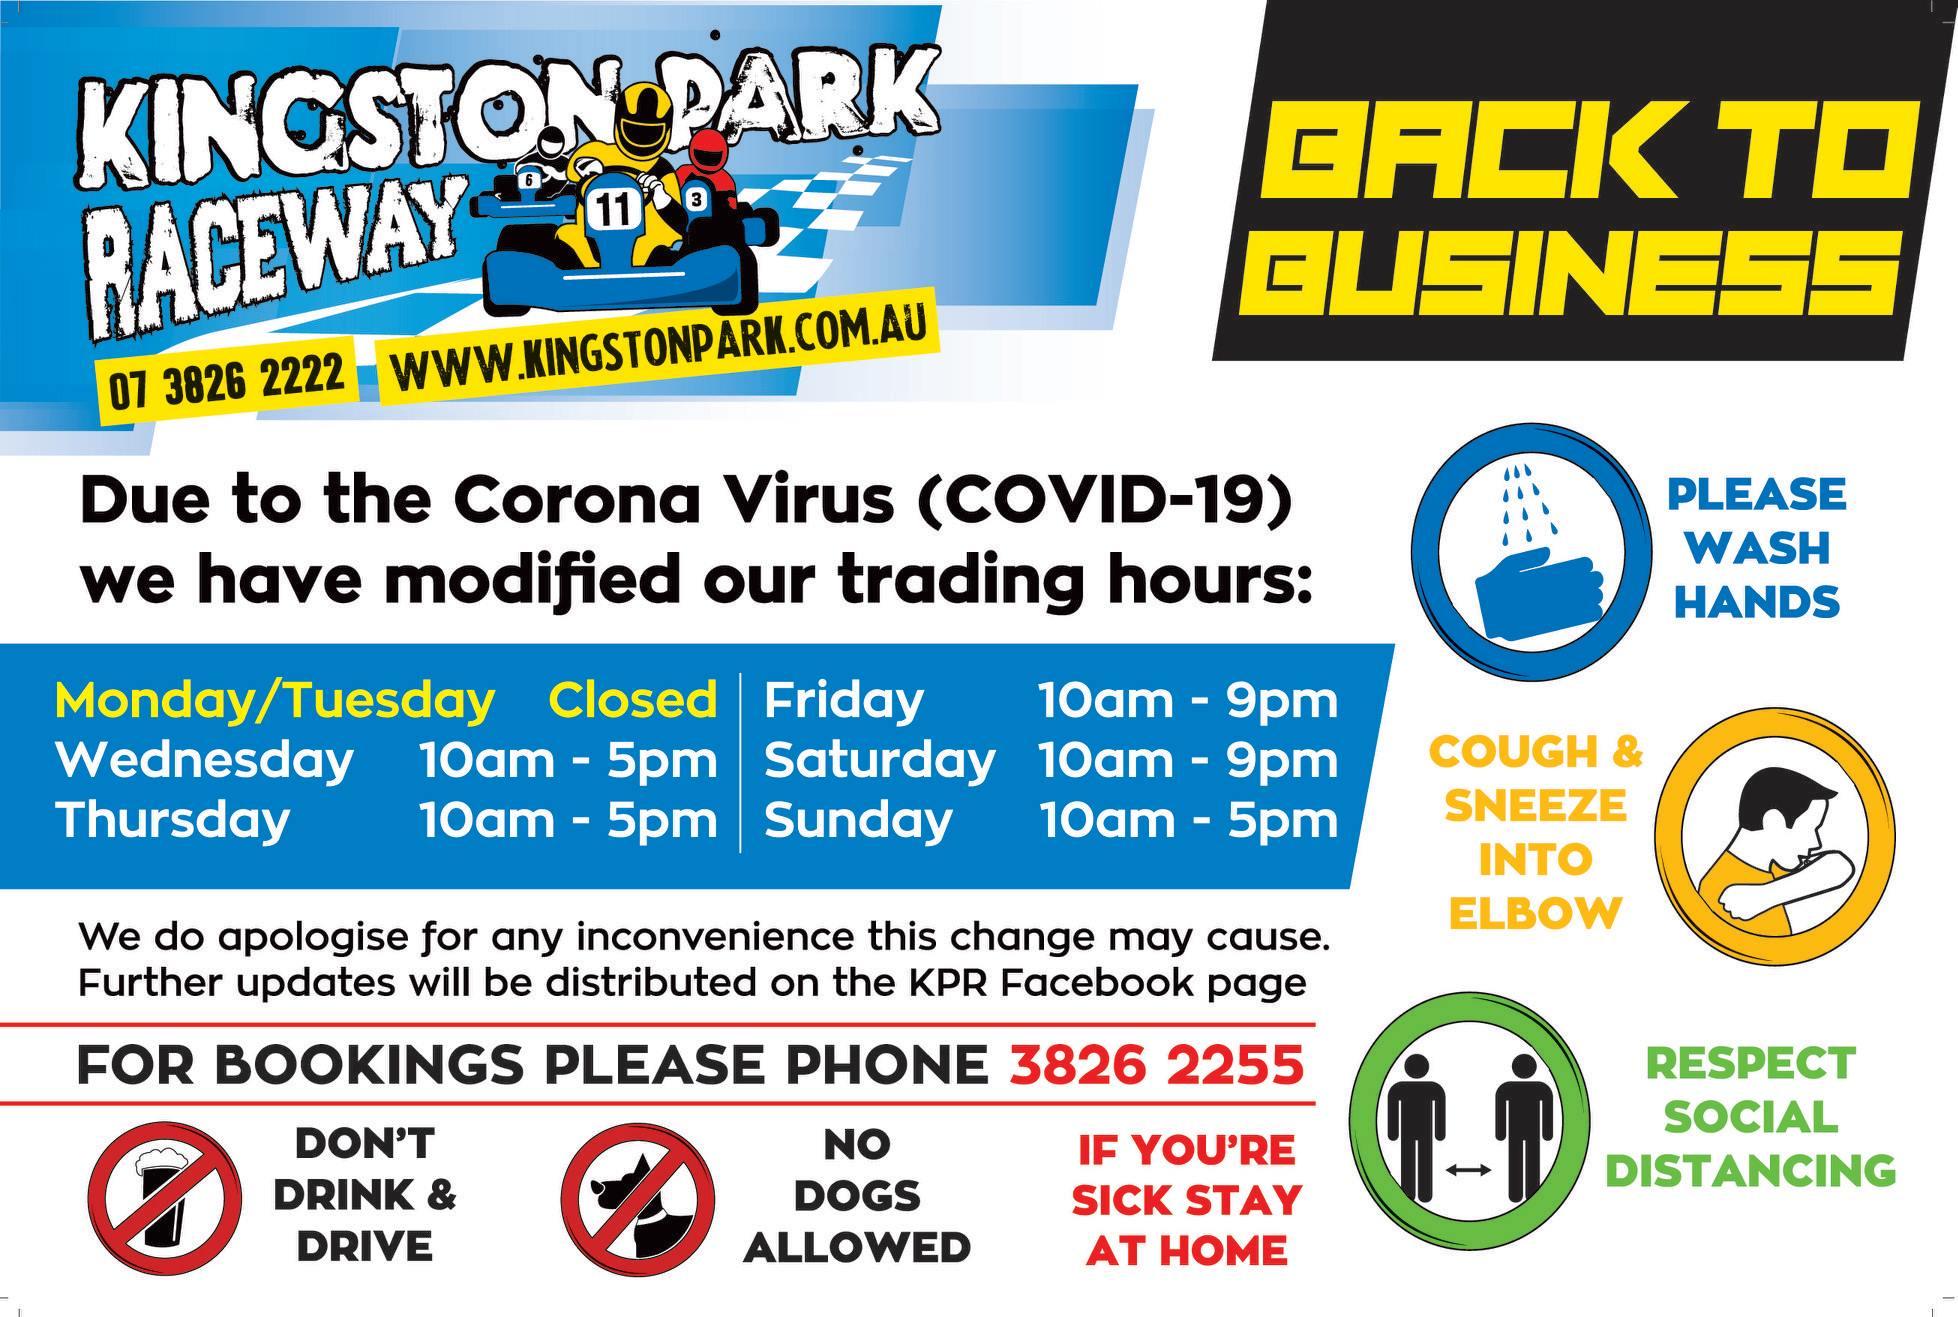 Kingston Park Raceway Trading Hours